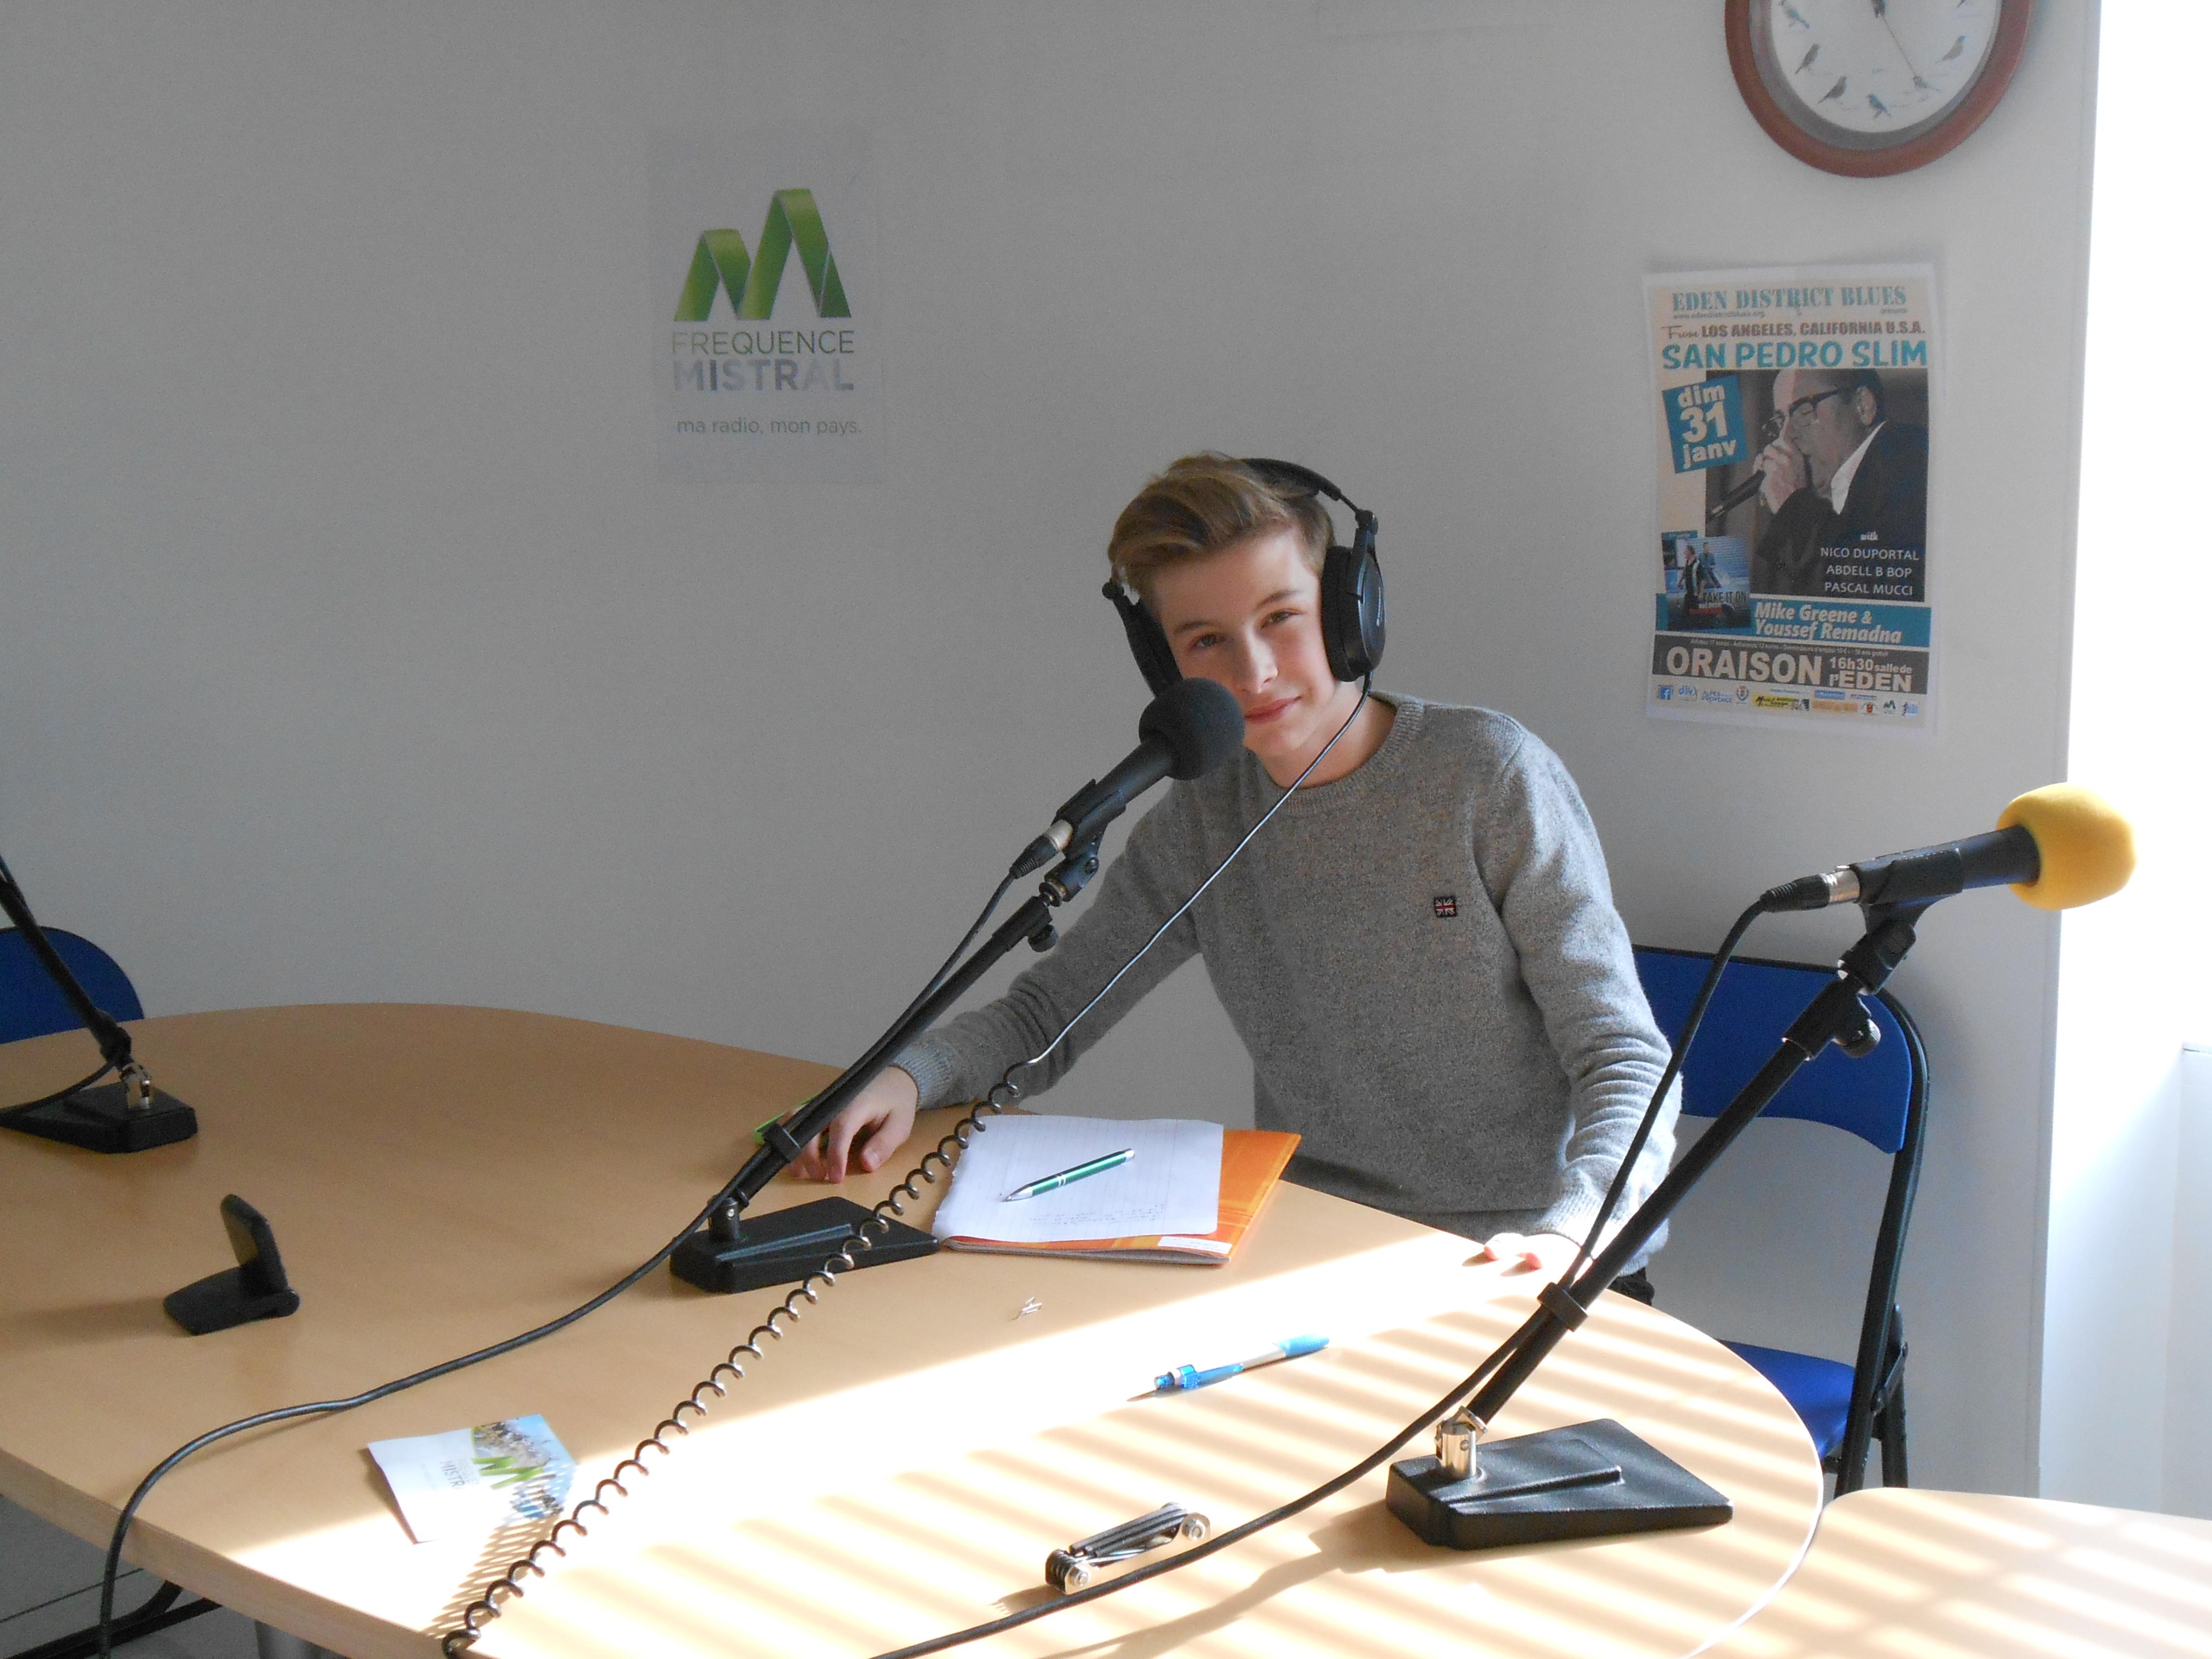 Antoine, stagiaire, finit sa semaine chez Fréquence Mistral Manosque